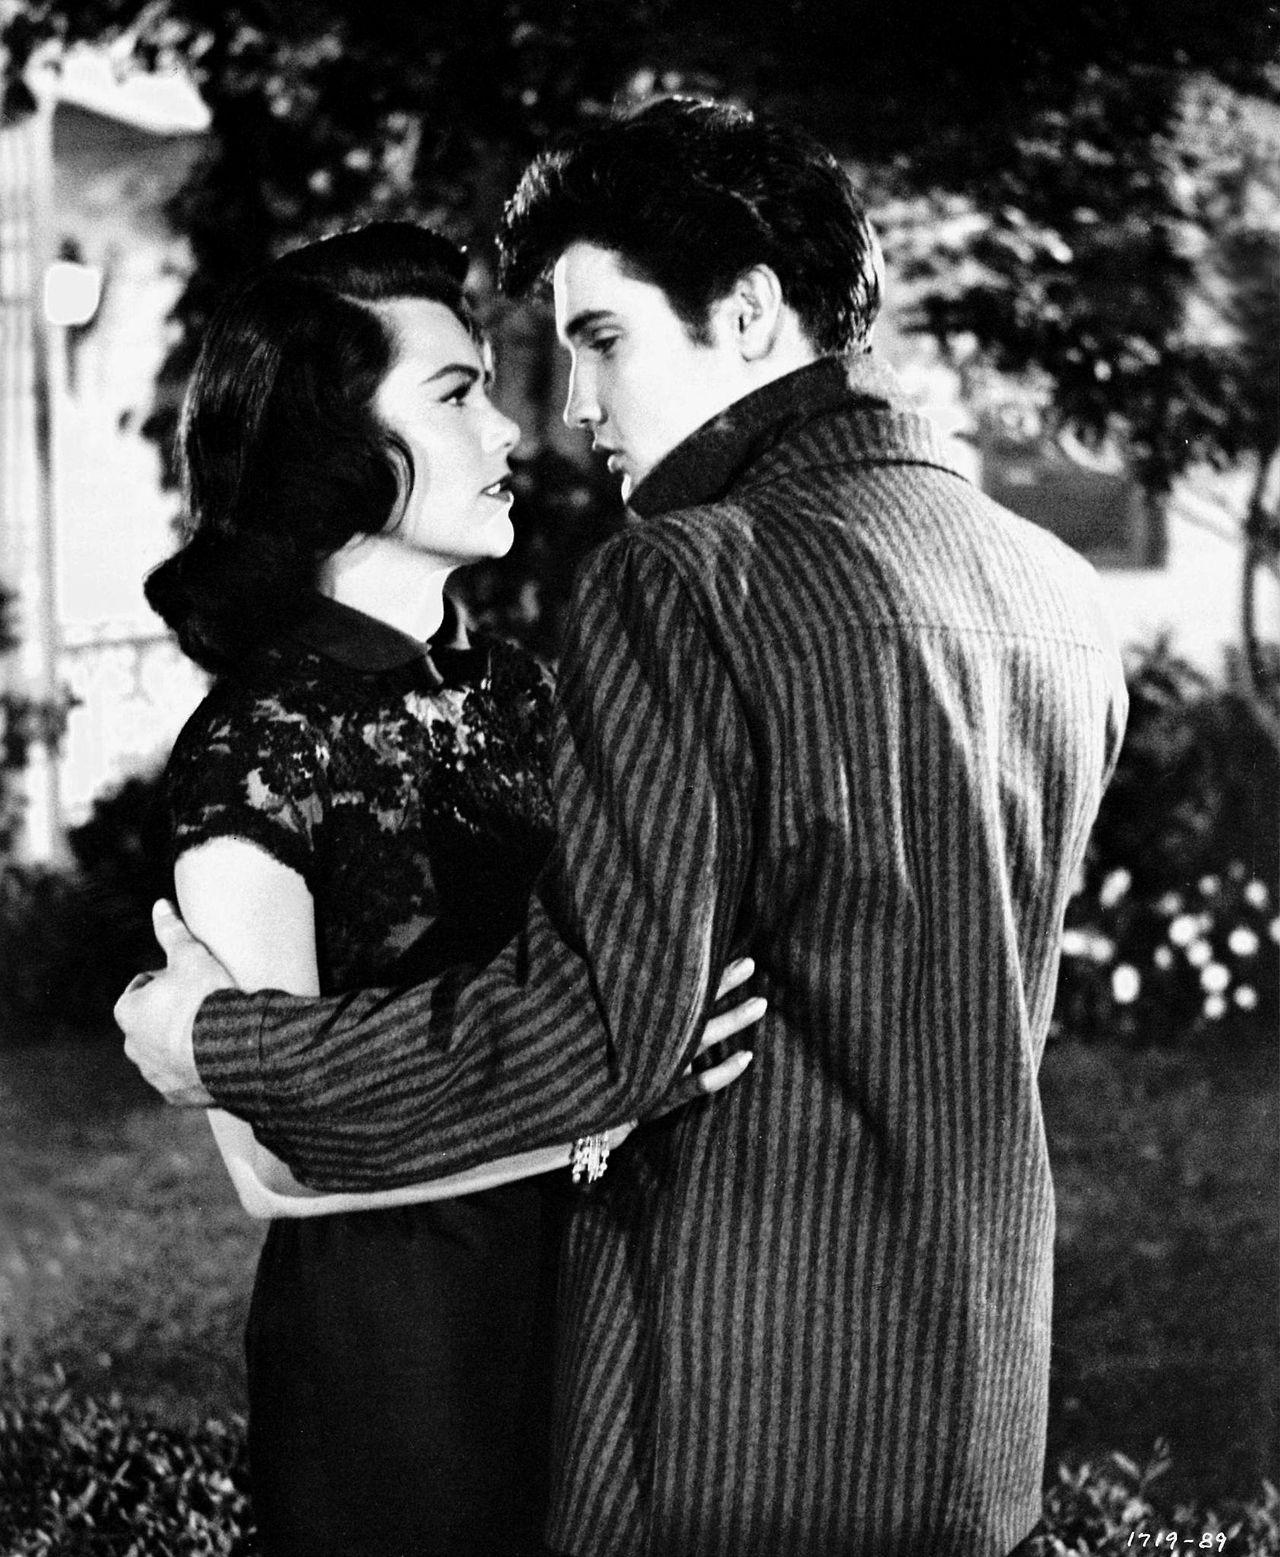 Judy Tyler & Elvis Presley Jailhouse Rock, 1957